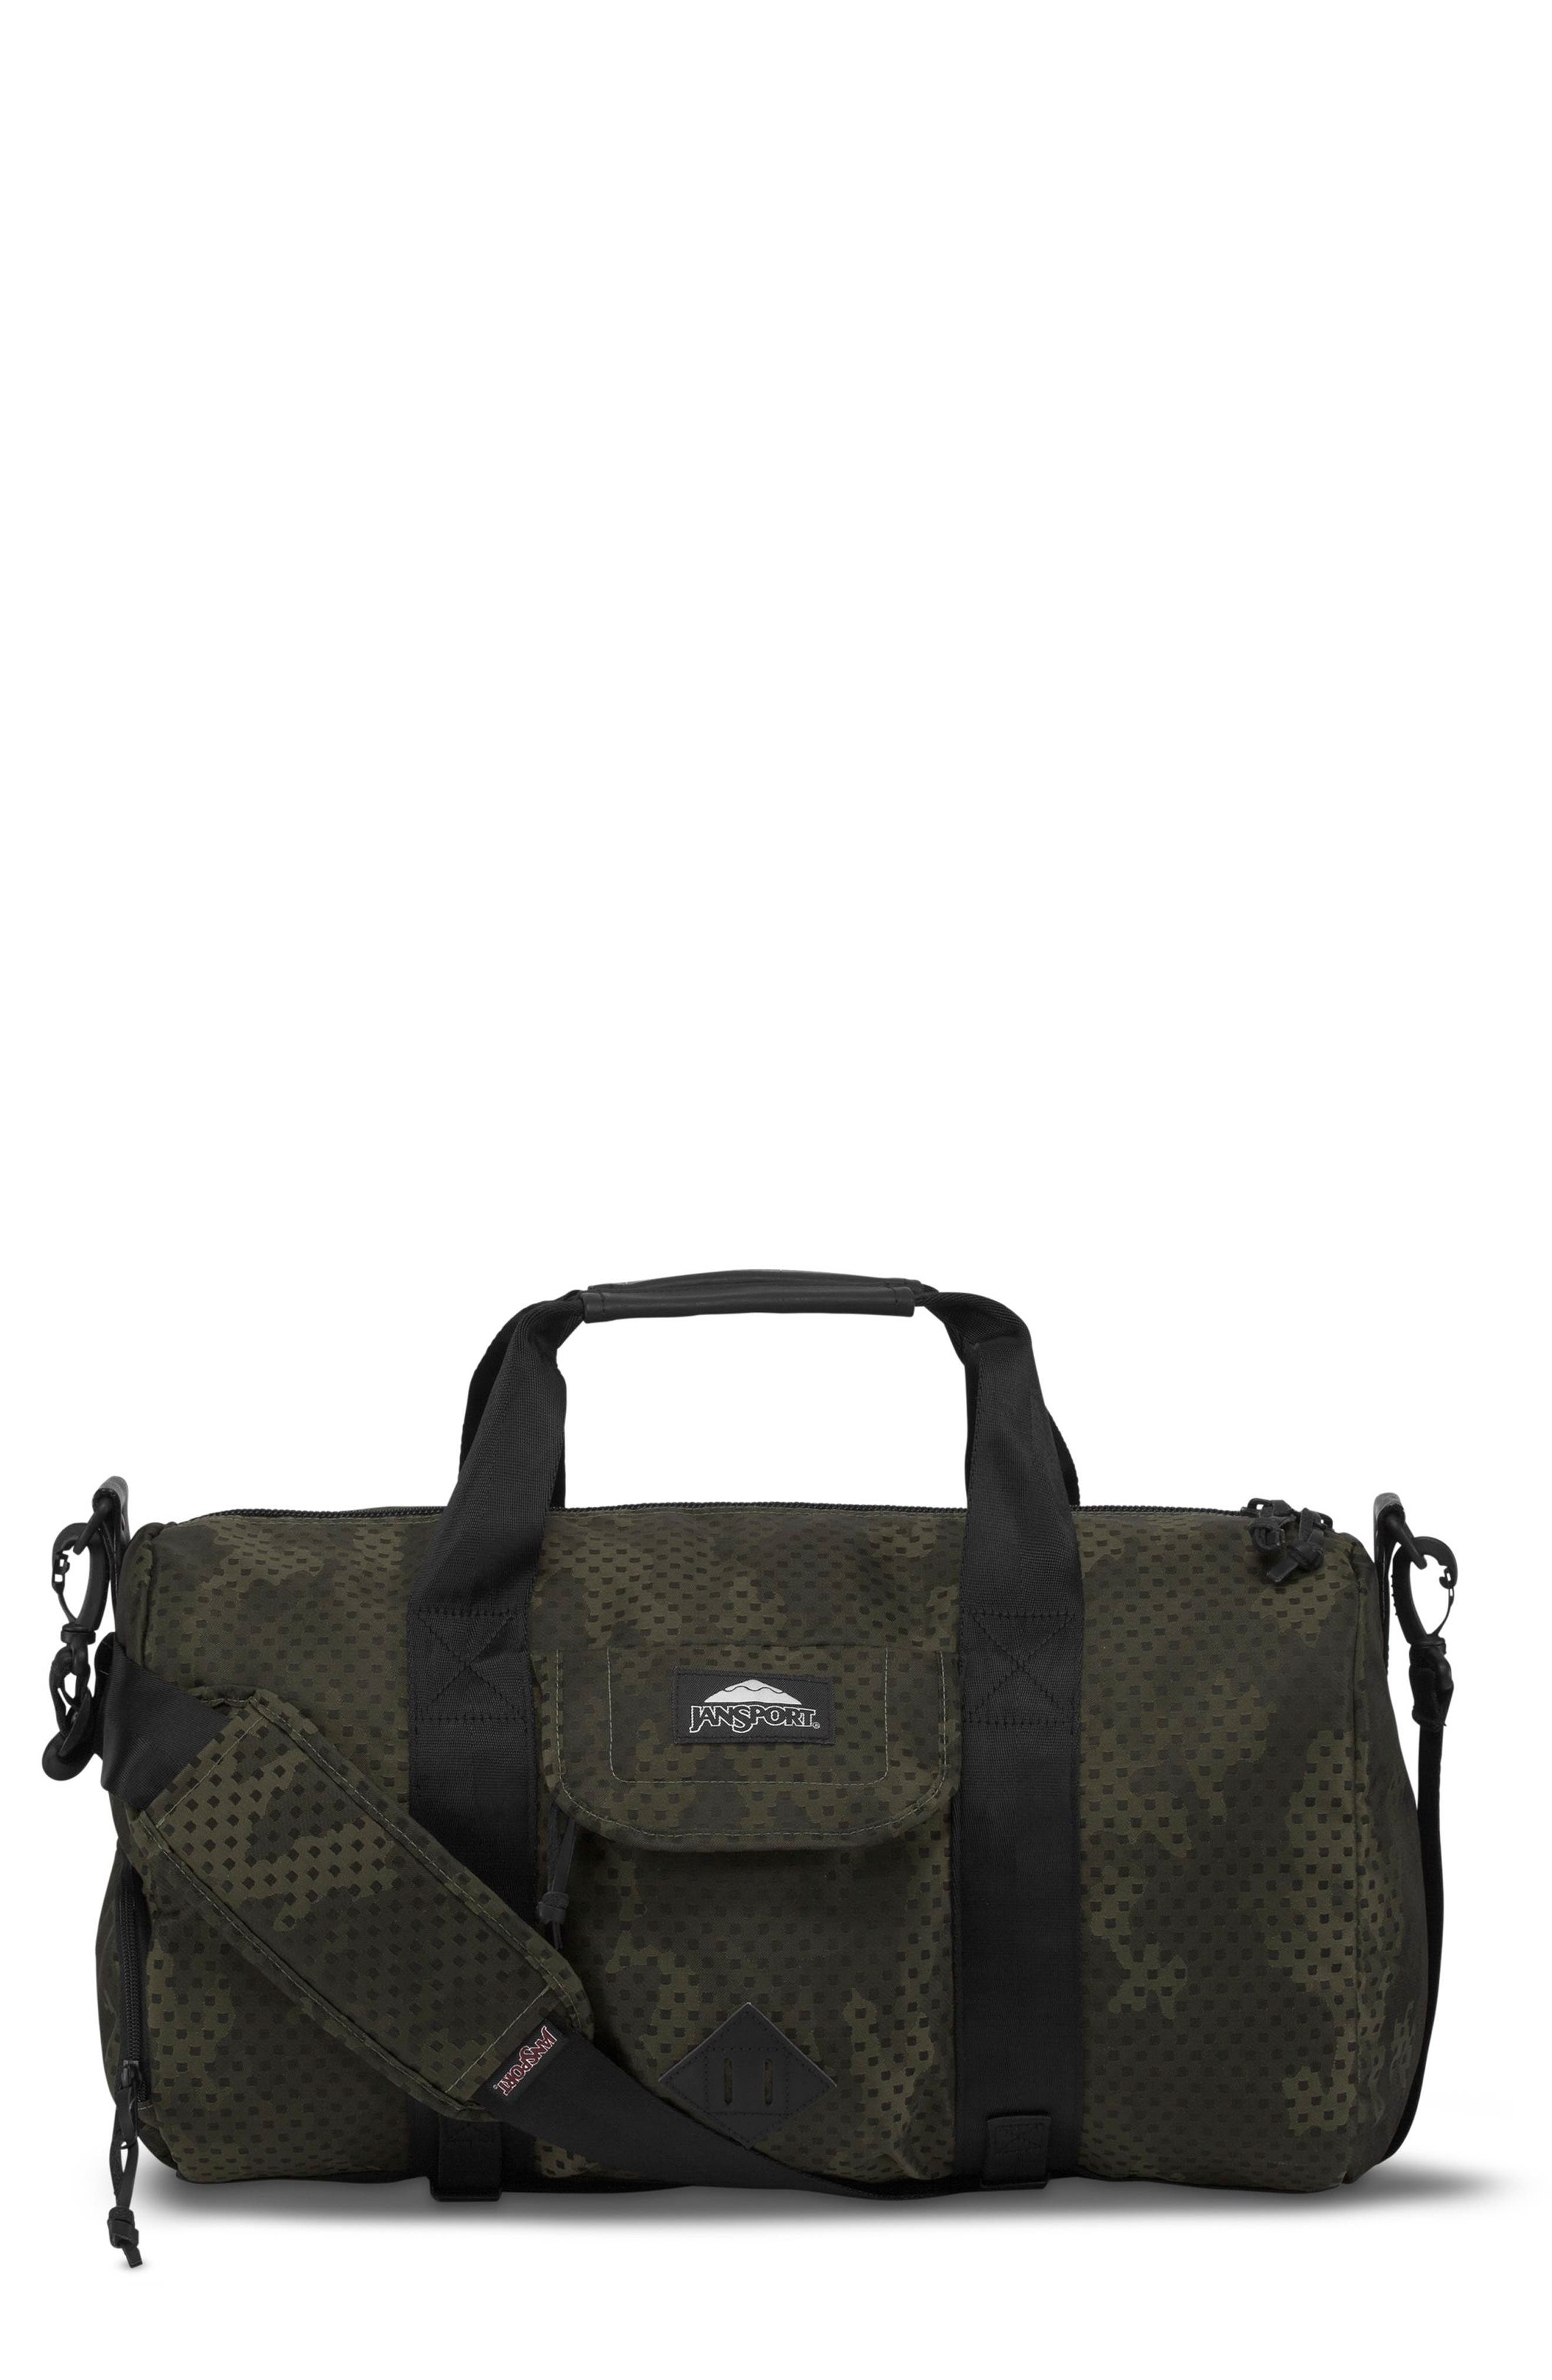 Wayward Duffel Bag,                         Main,                         color, Green Square Camo